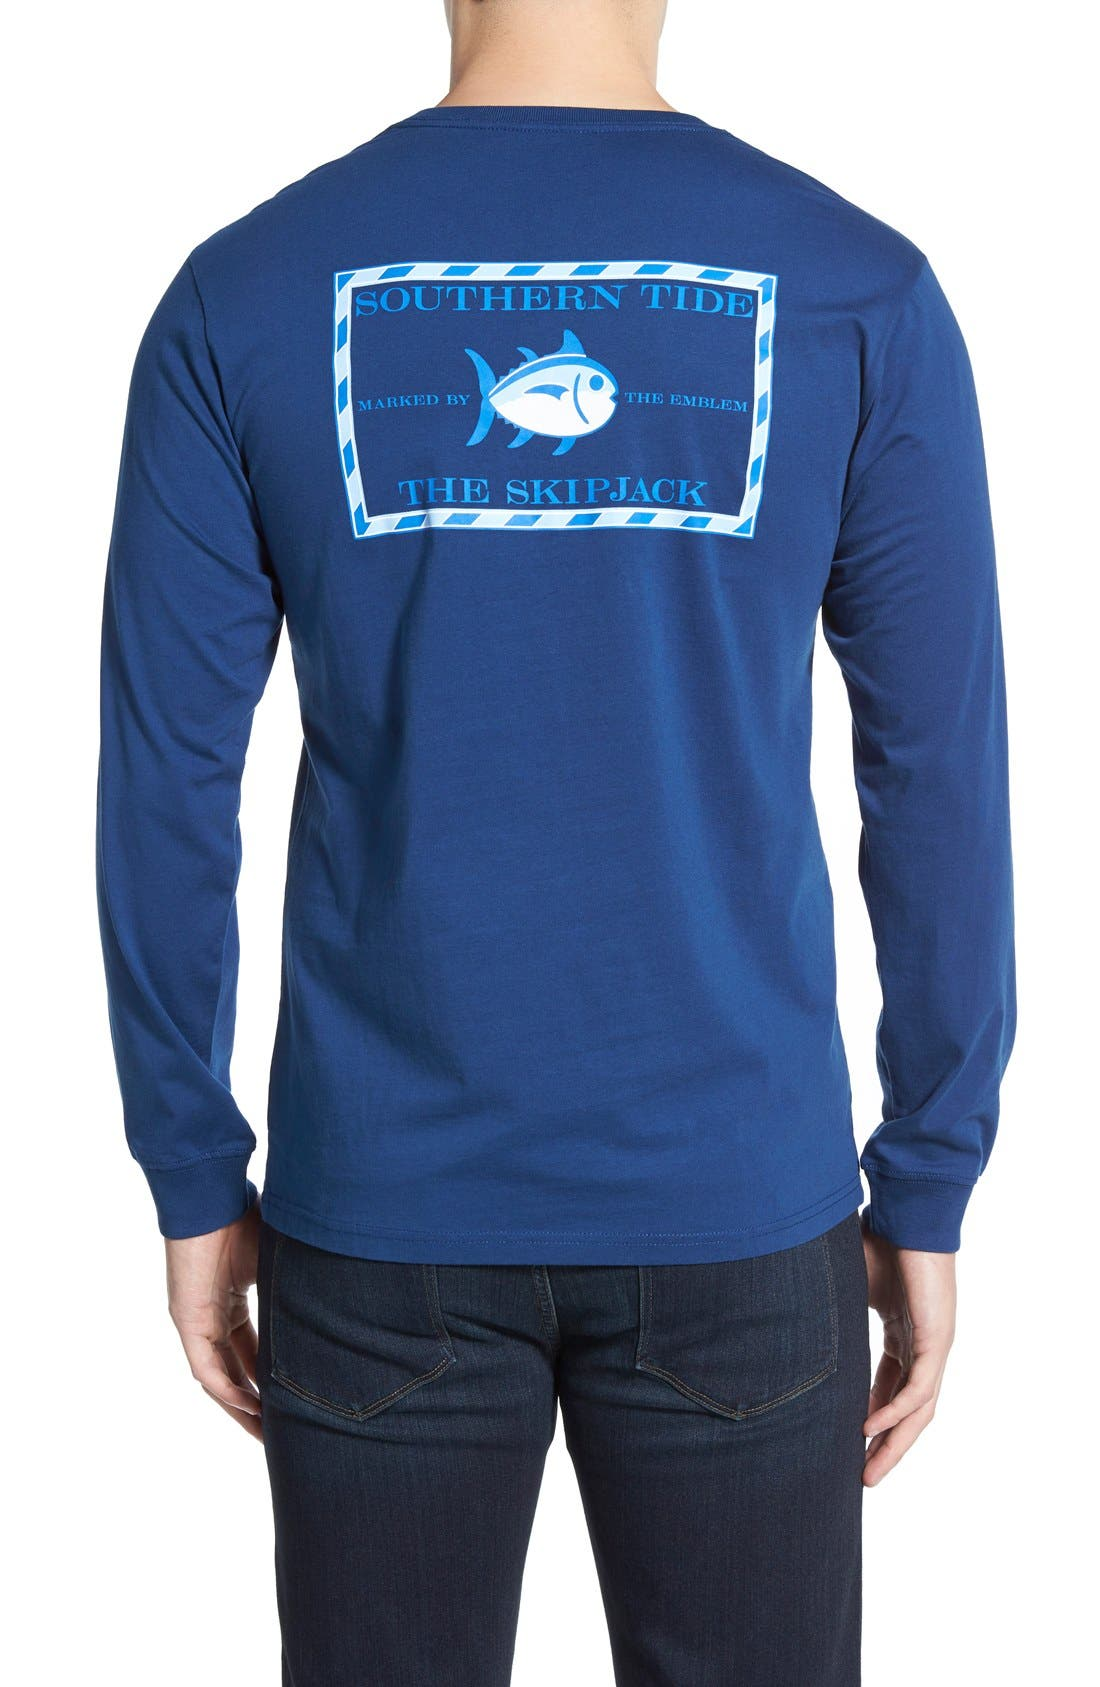 Alternate Image 1 Selected - Southern Tide 'Skipjack'Long Sleeve Graphic T-Shirt